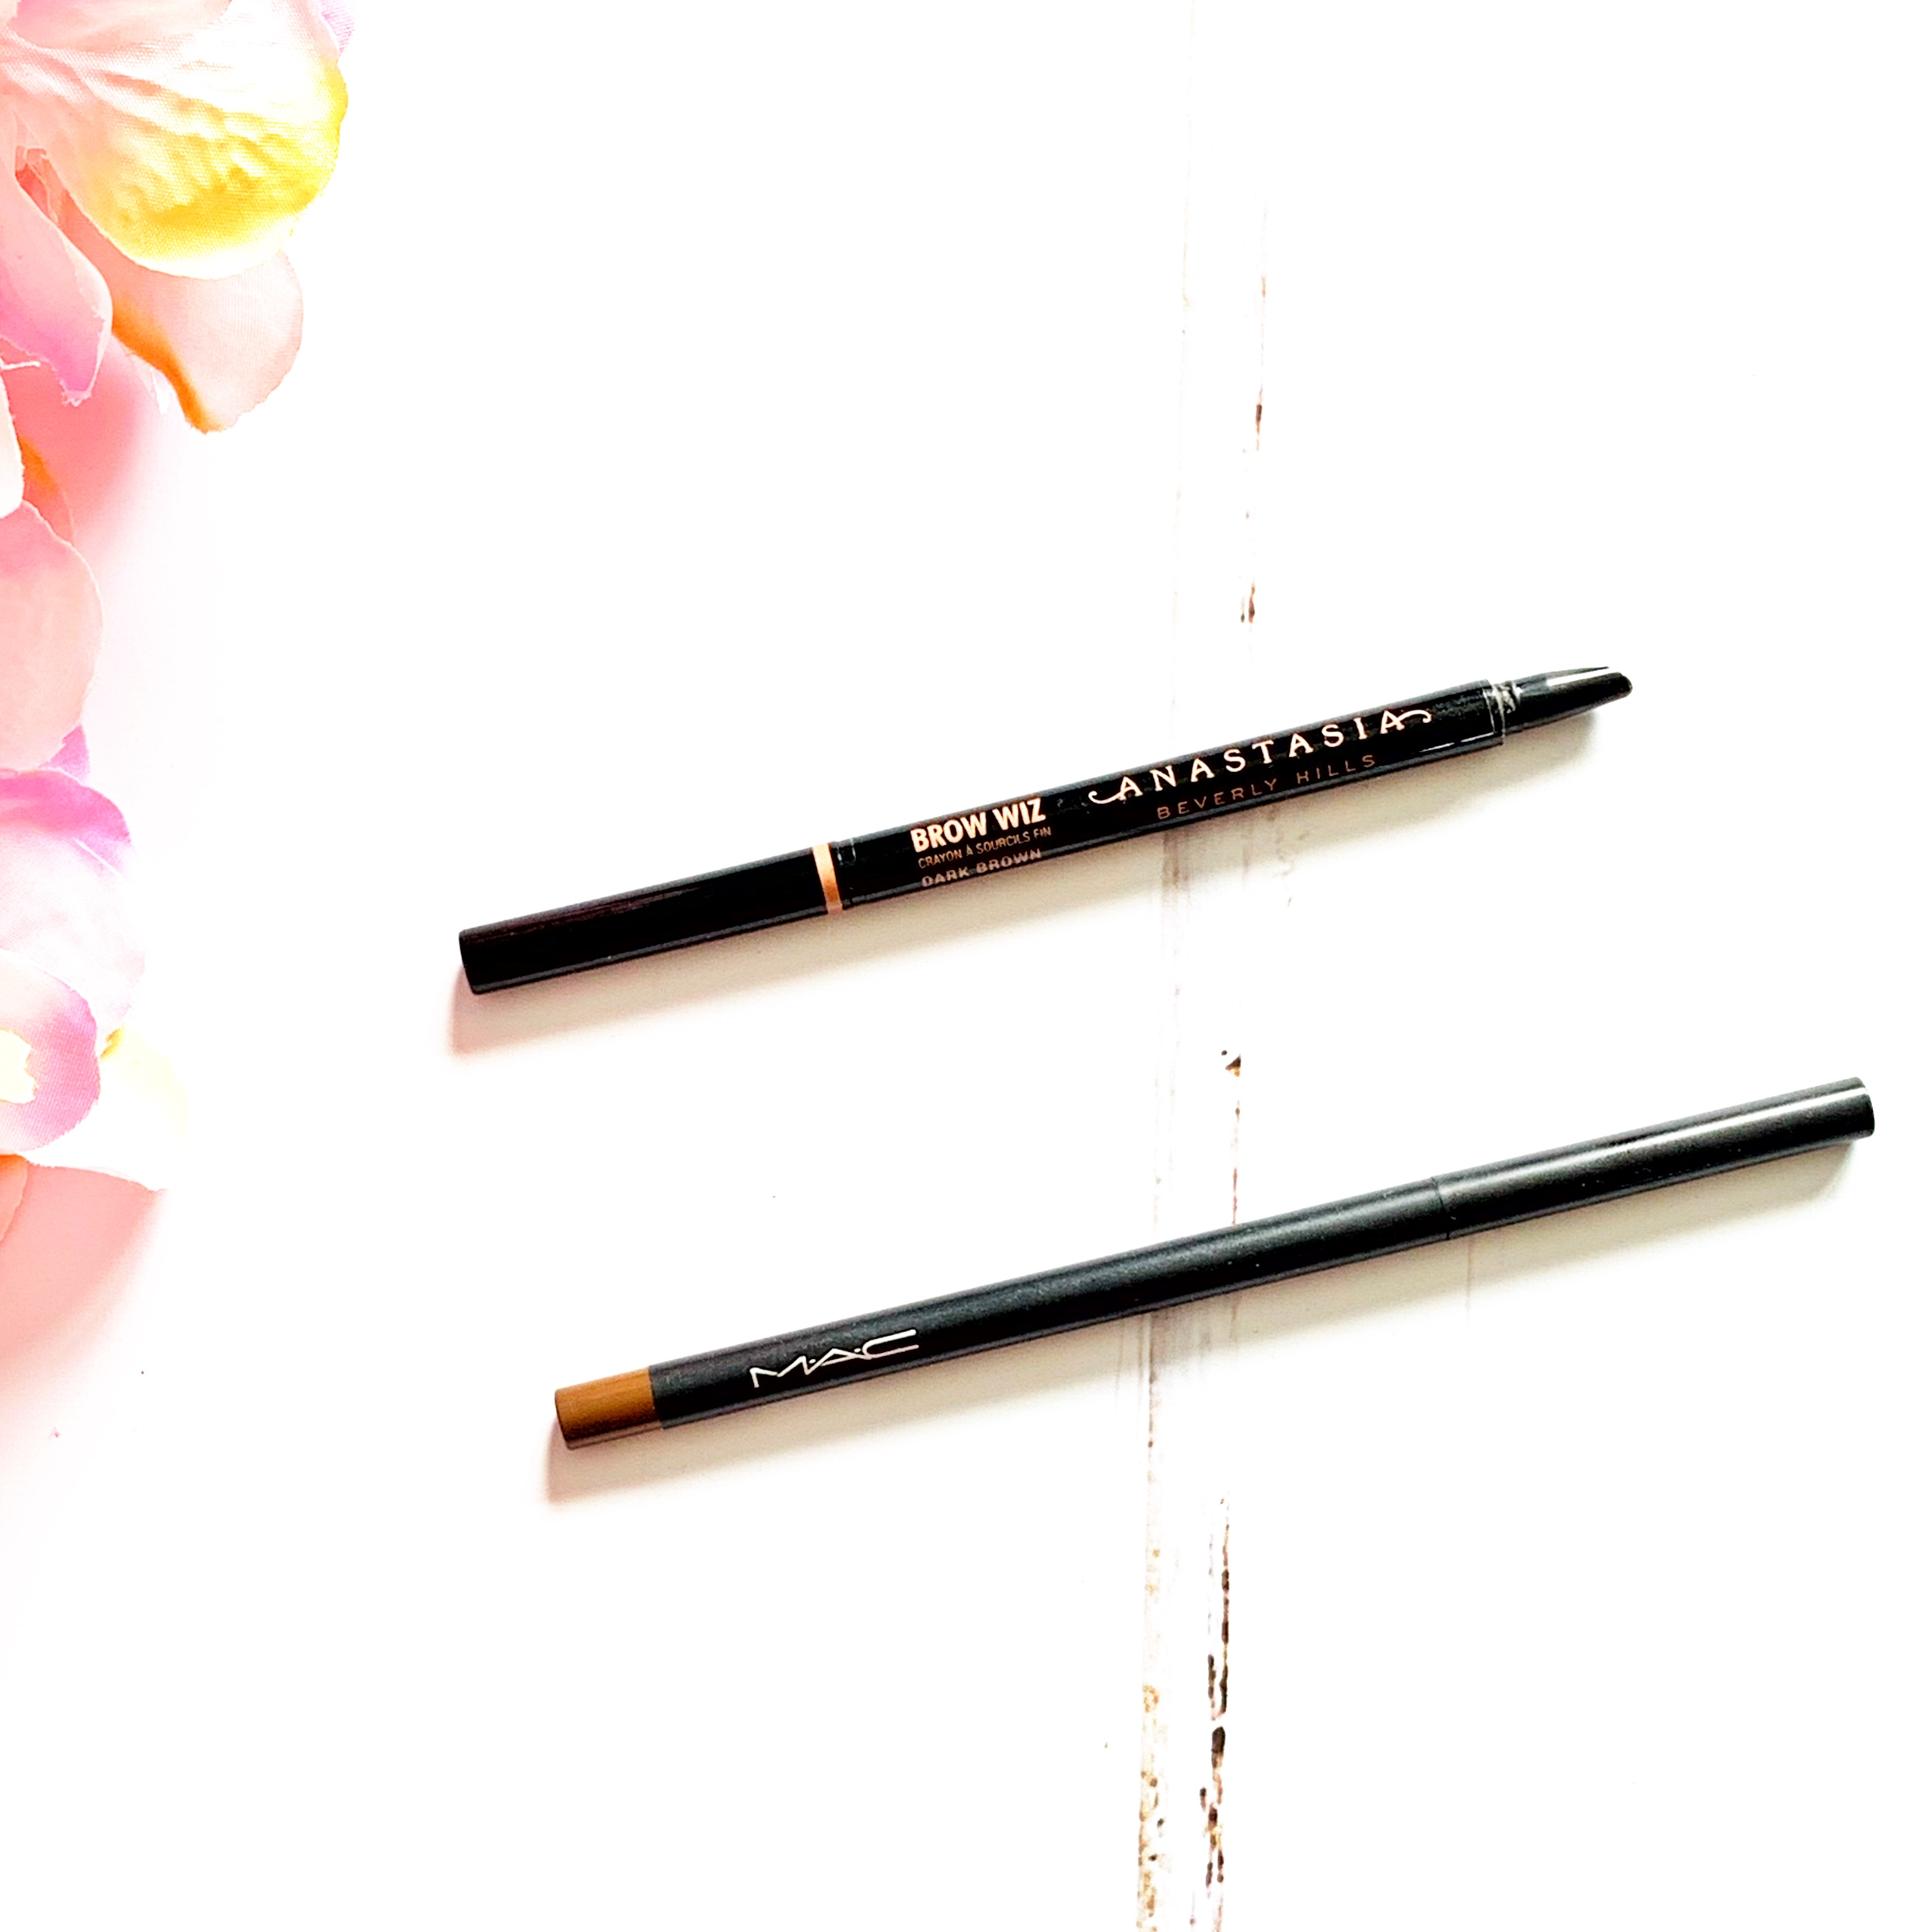 Anastasia Beverly Hills Brow Wizz & Mac Brow Pencil